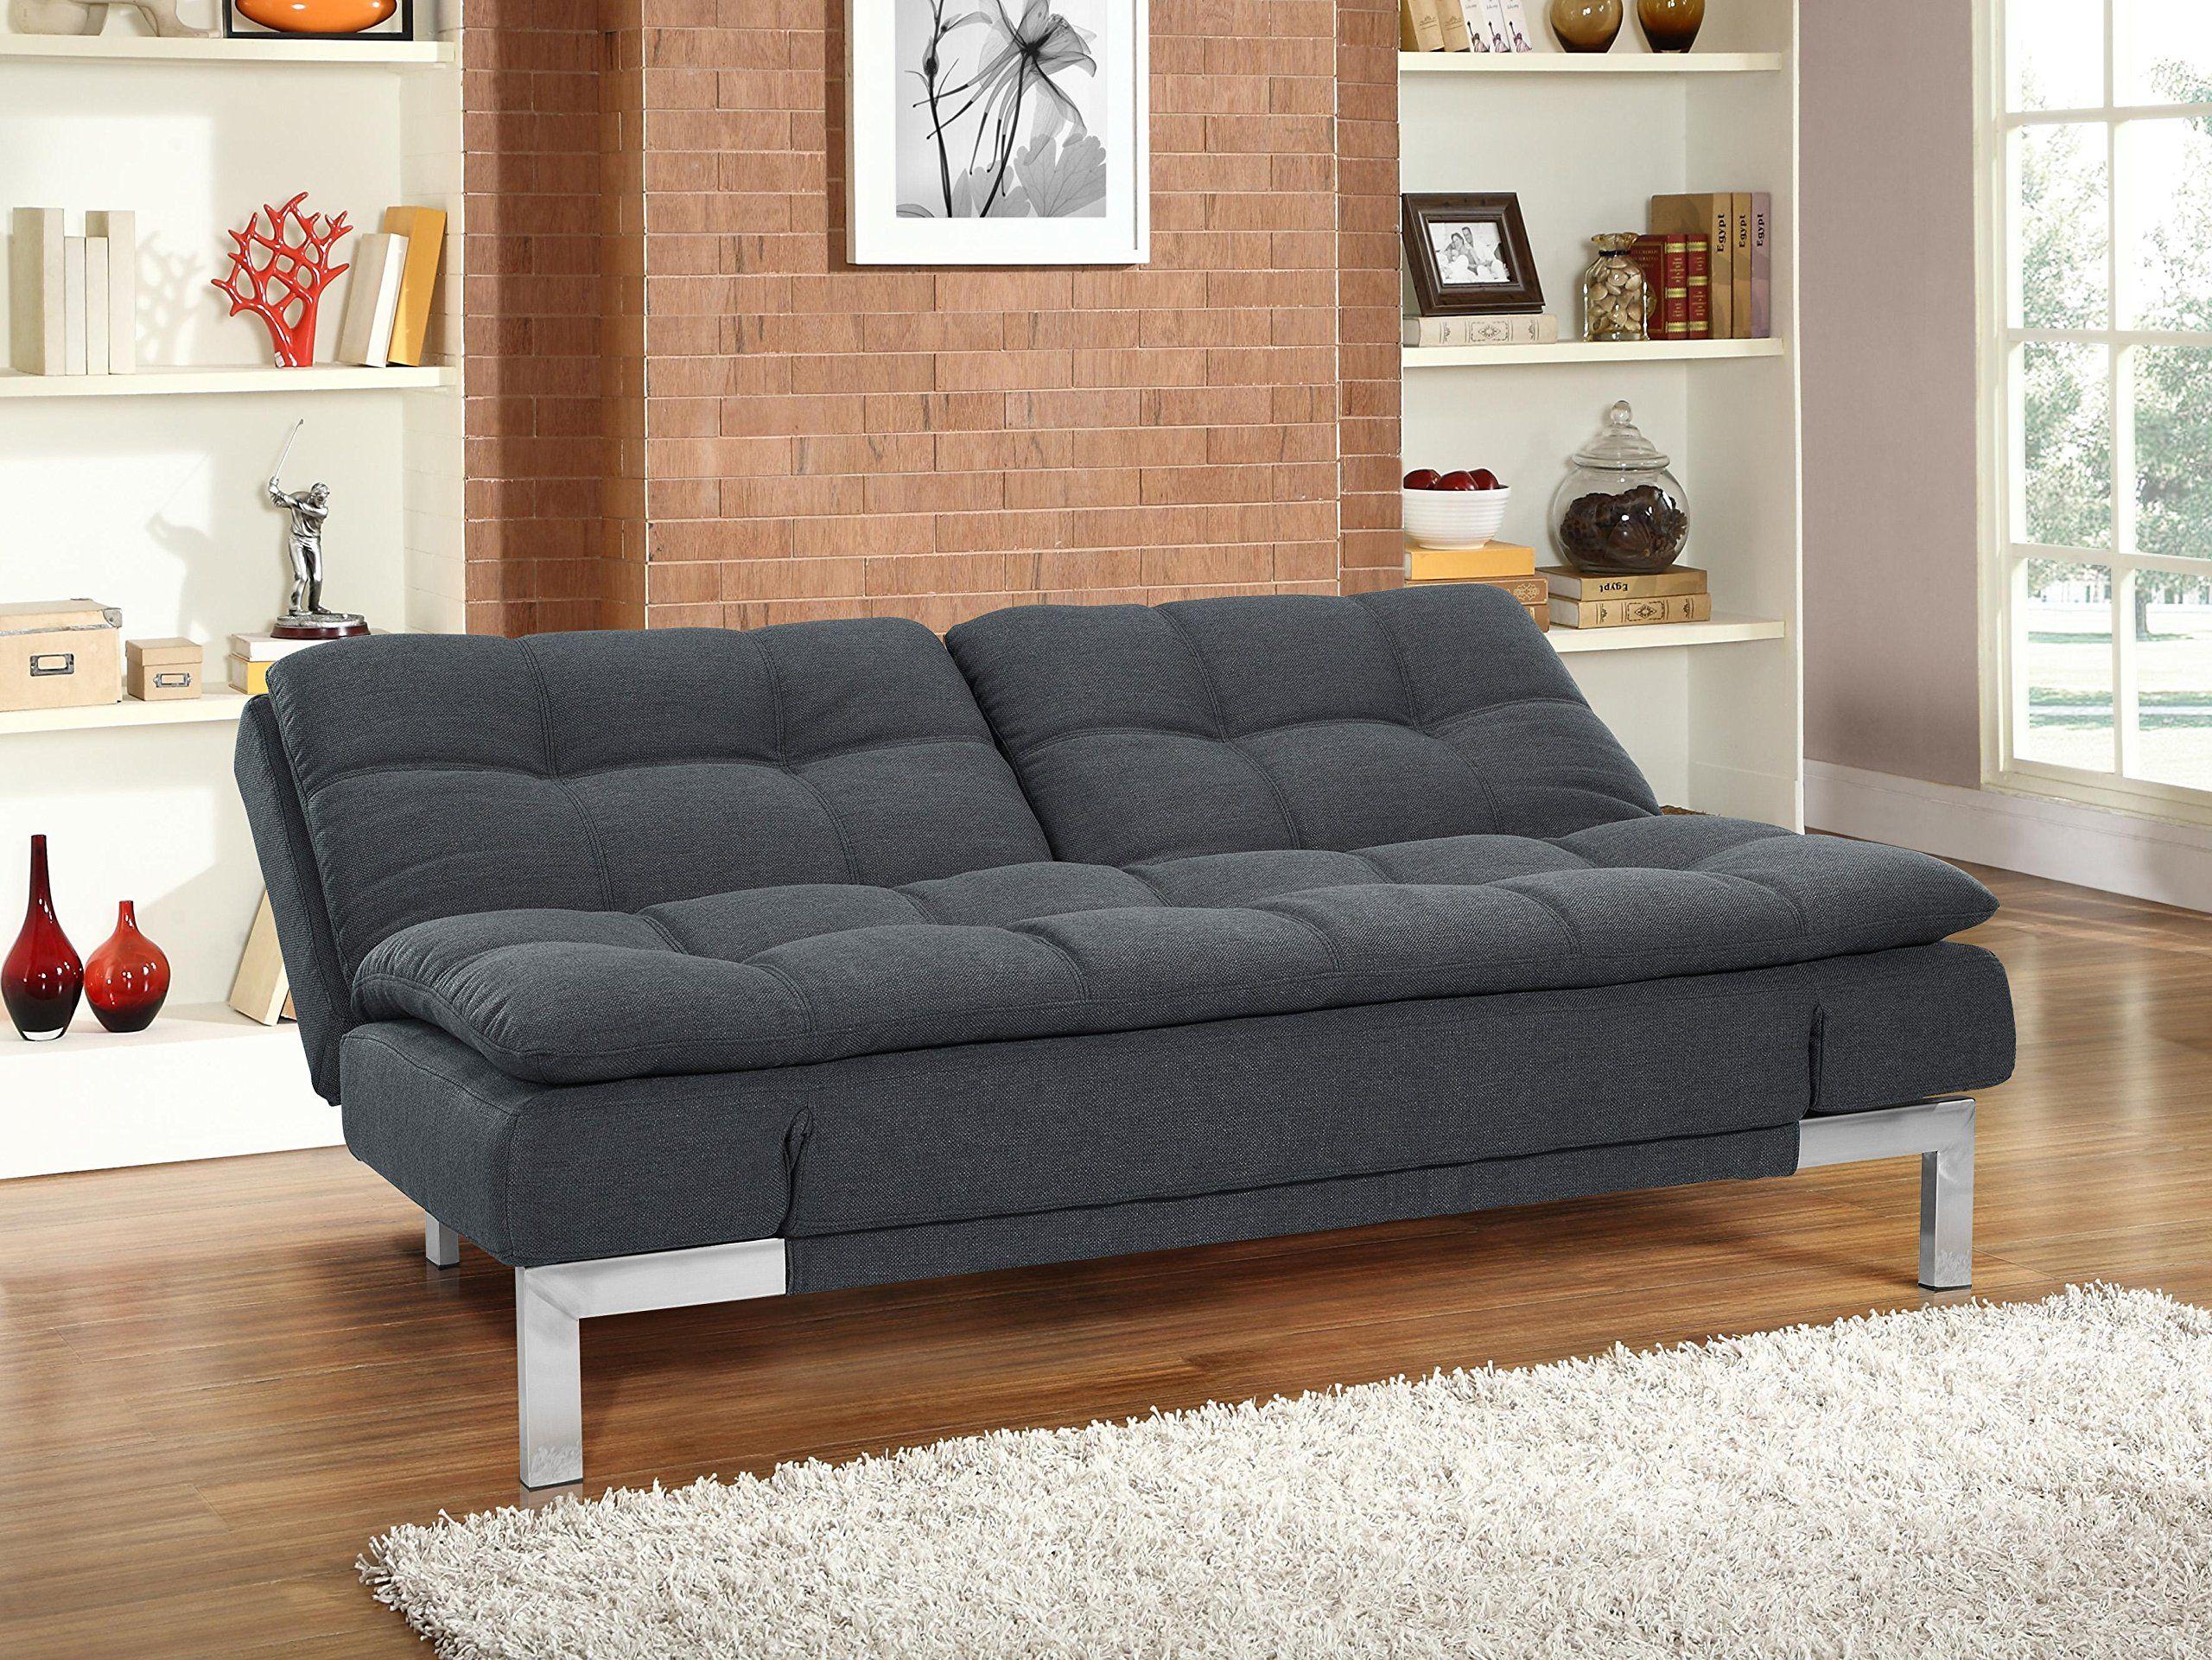 Amazon Com Serta Dream Convertible Boca Sofa Futons Sofa Convertible Sofa